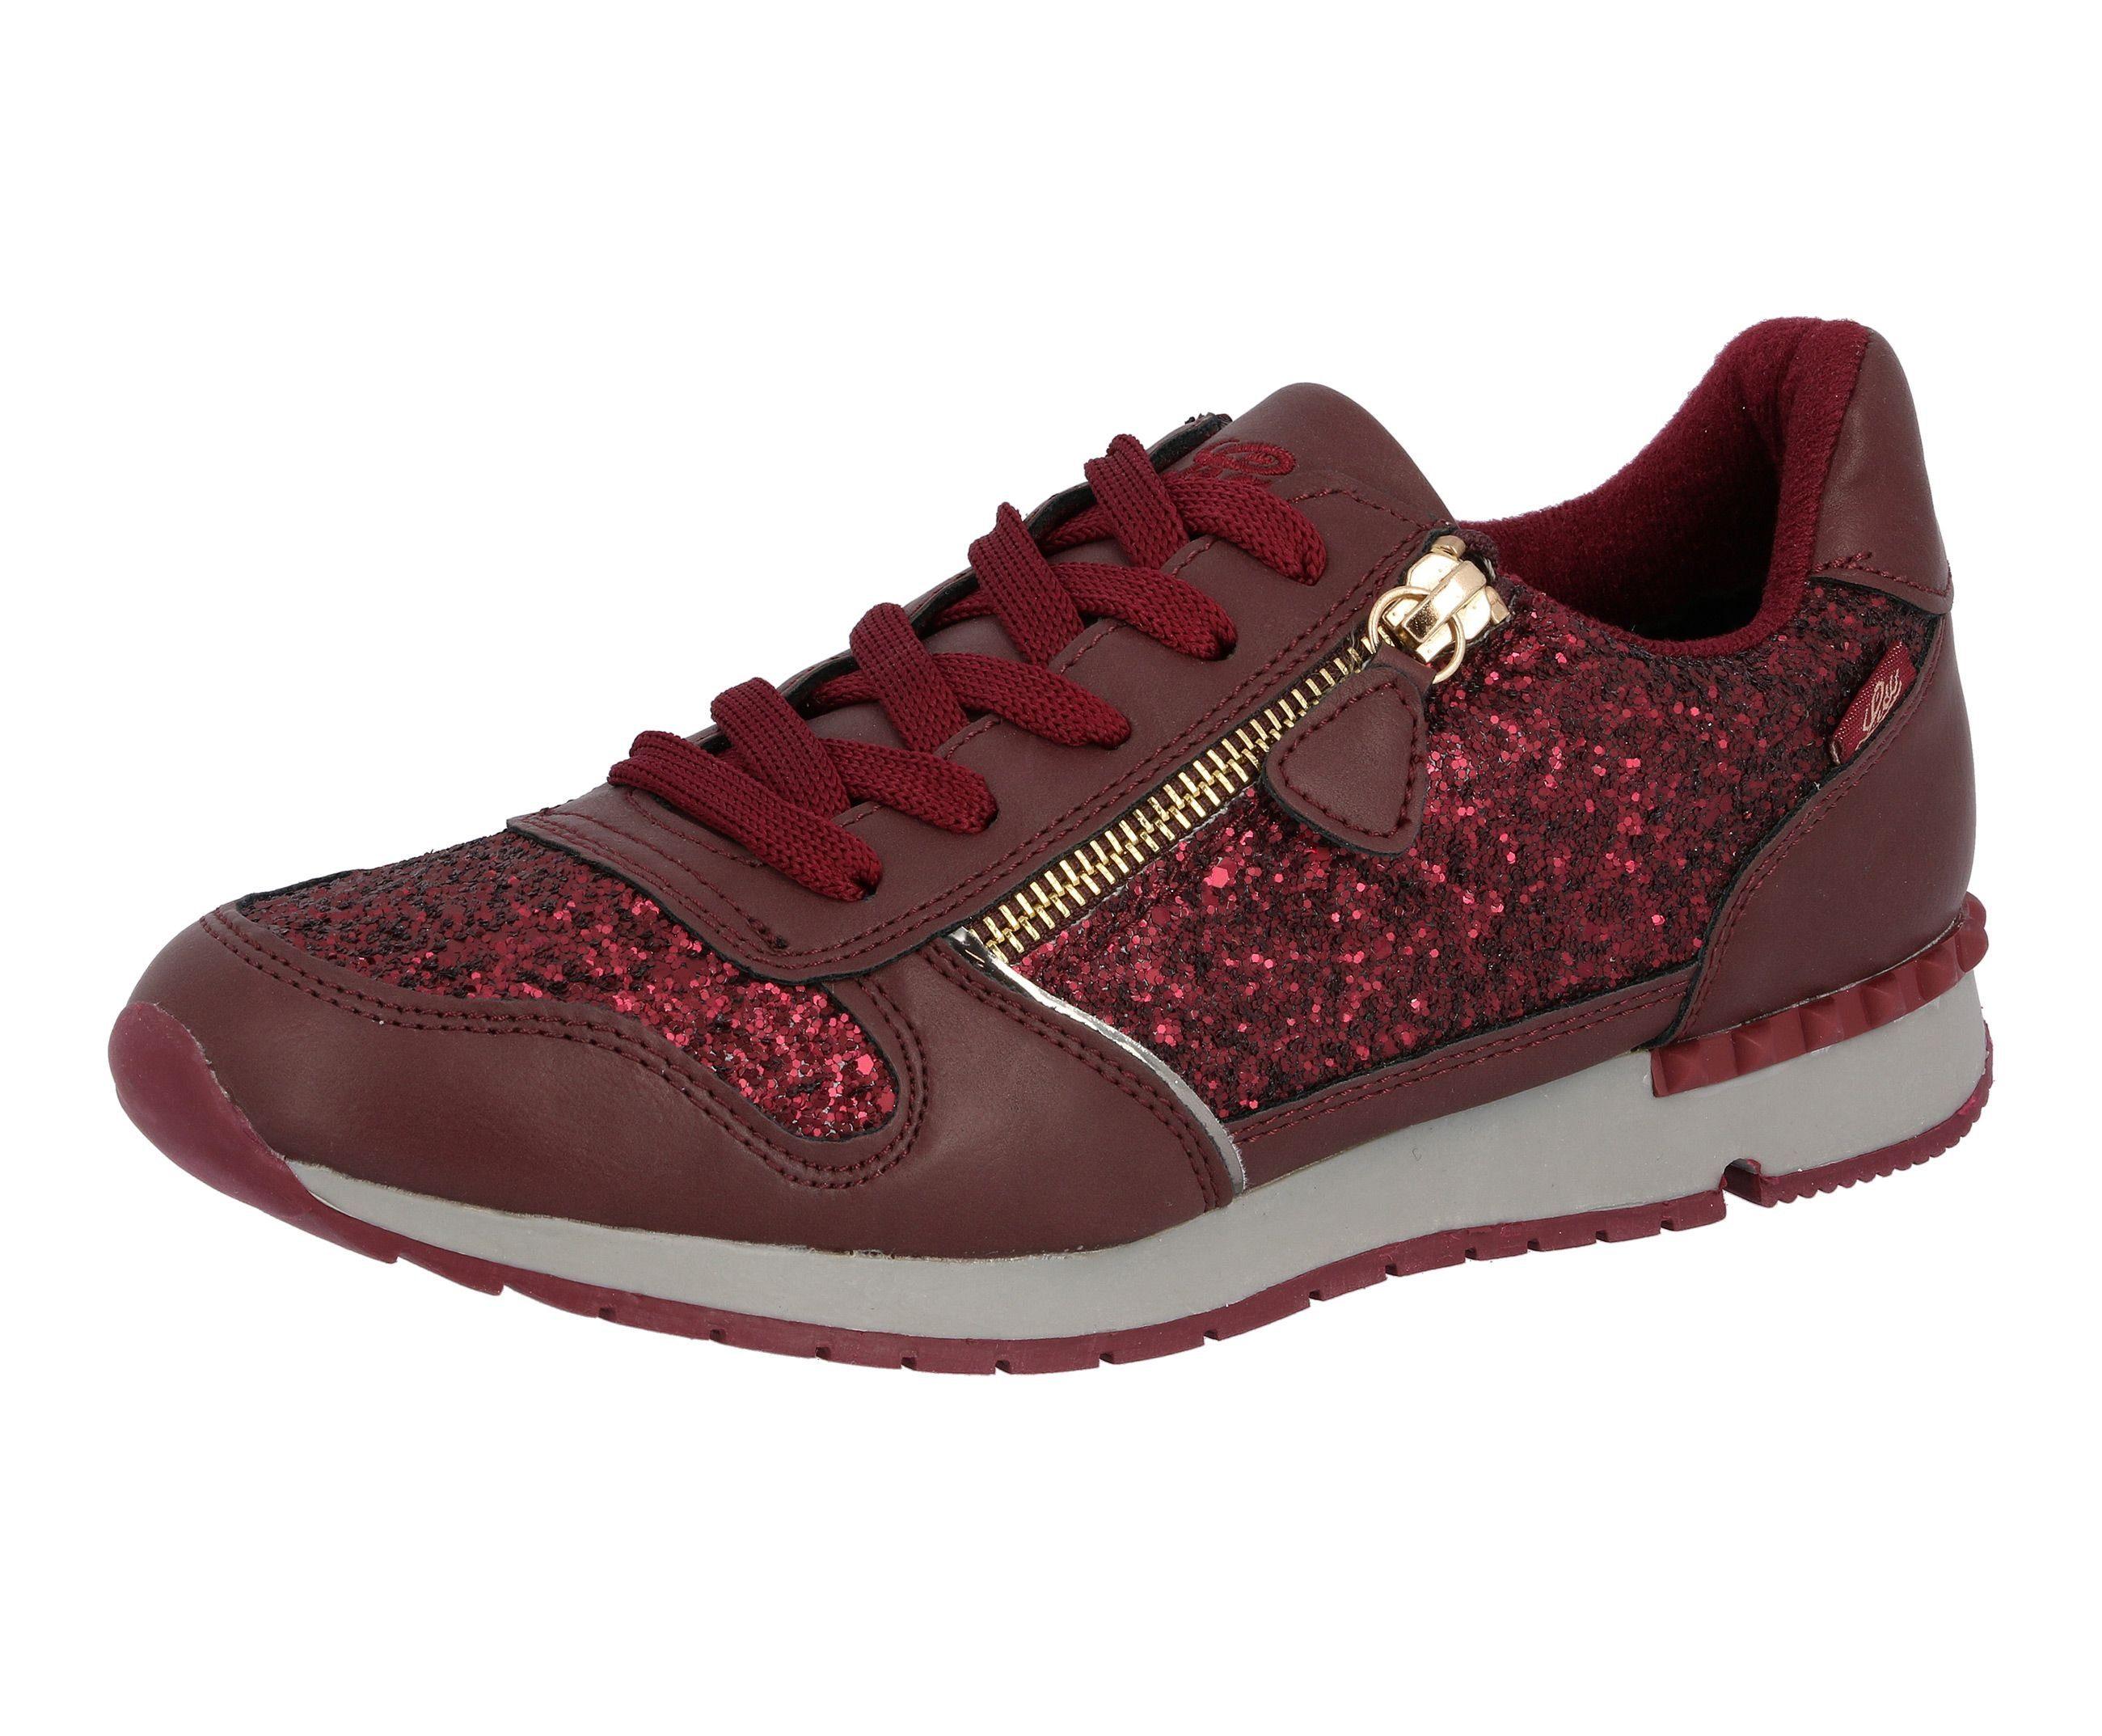 Lico Sneaker Trendschuh Ginger High